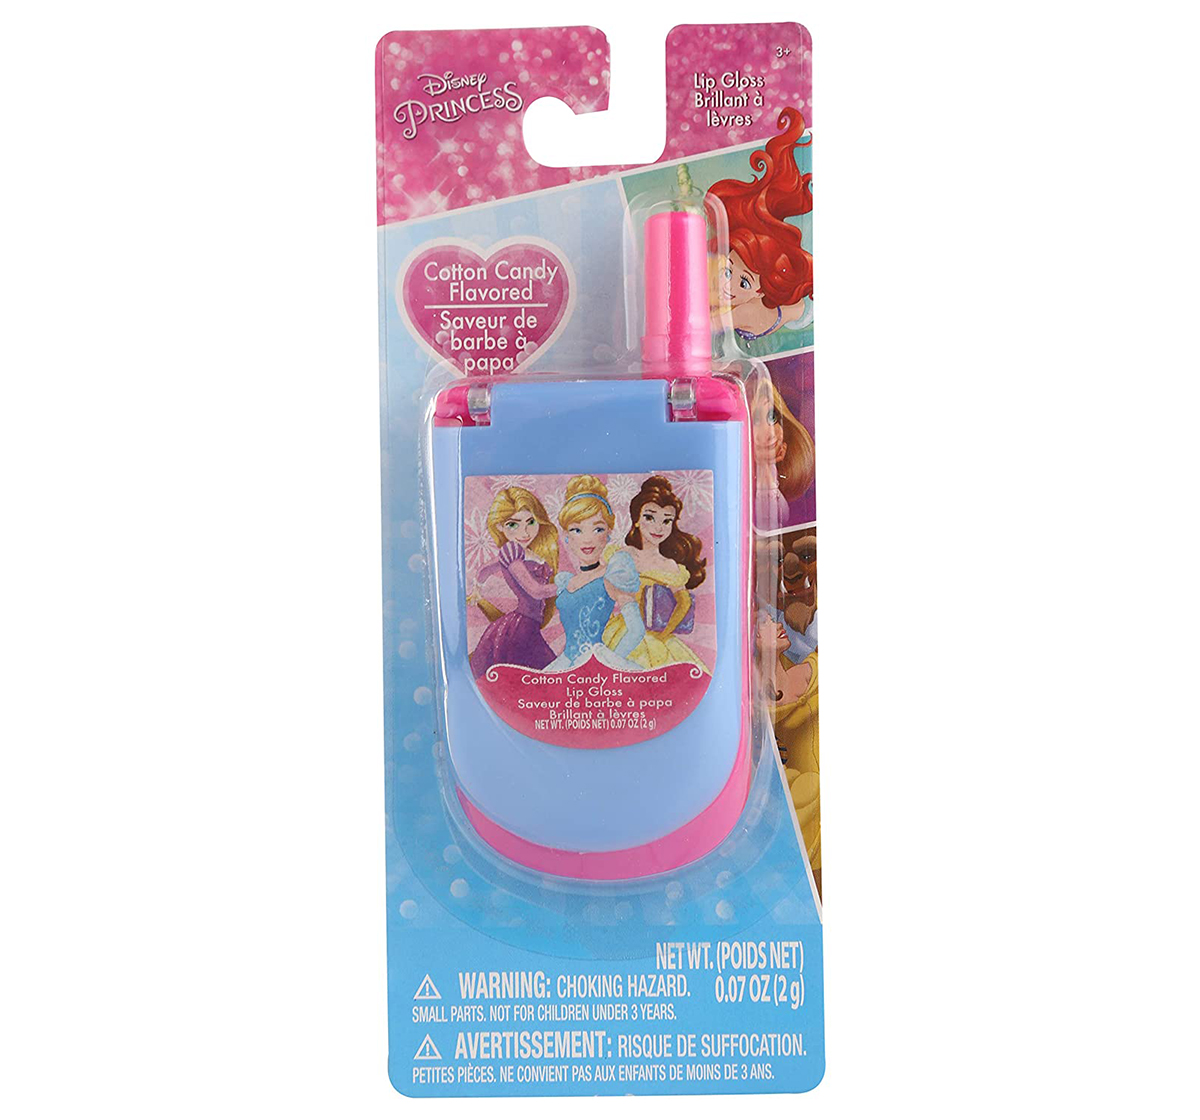 Townley Girl | Townley Girl Disney Princess Lip Gloss Cell Phone  DIY Art & Craft Kits for Girls age 3Y+